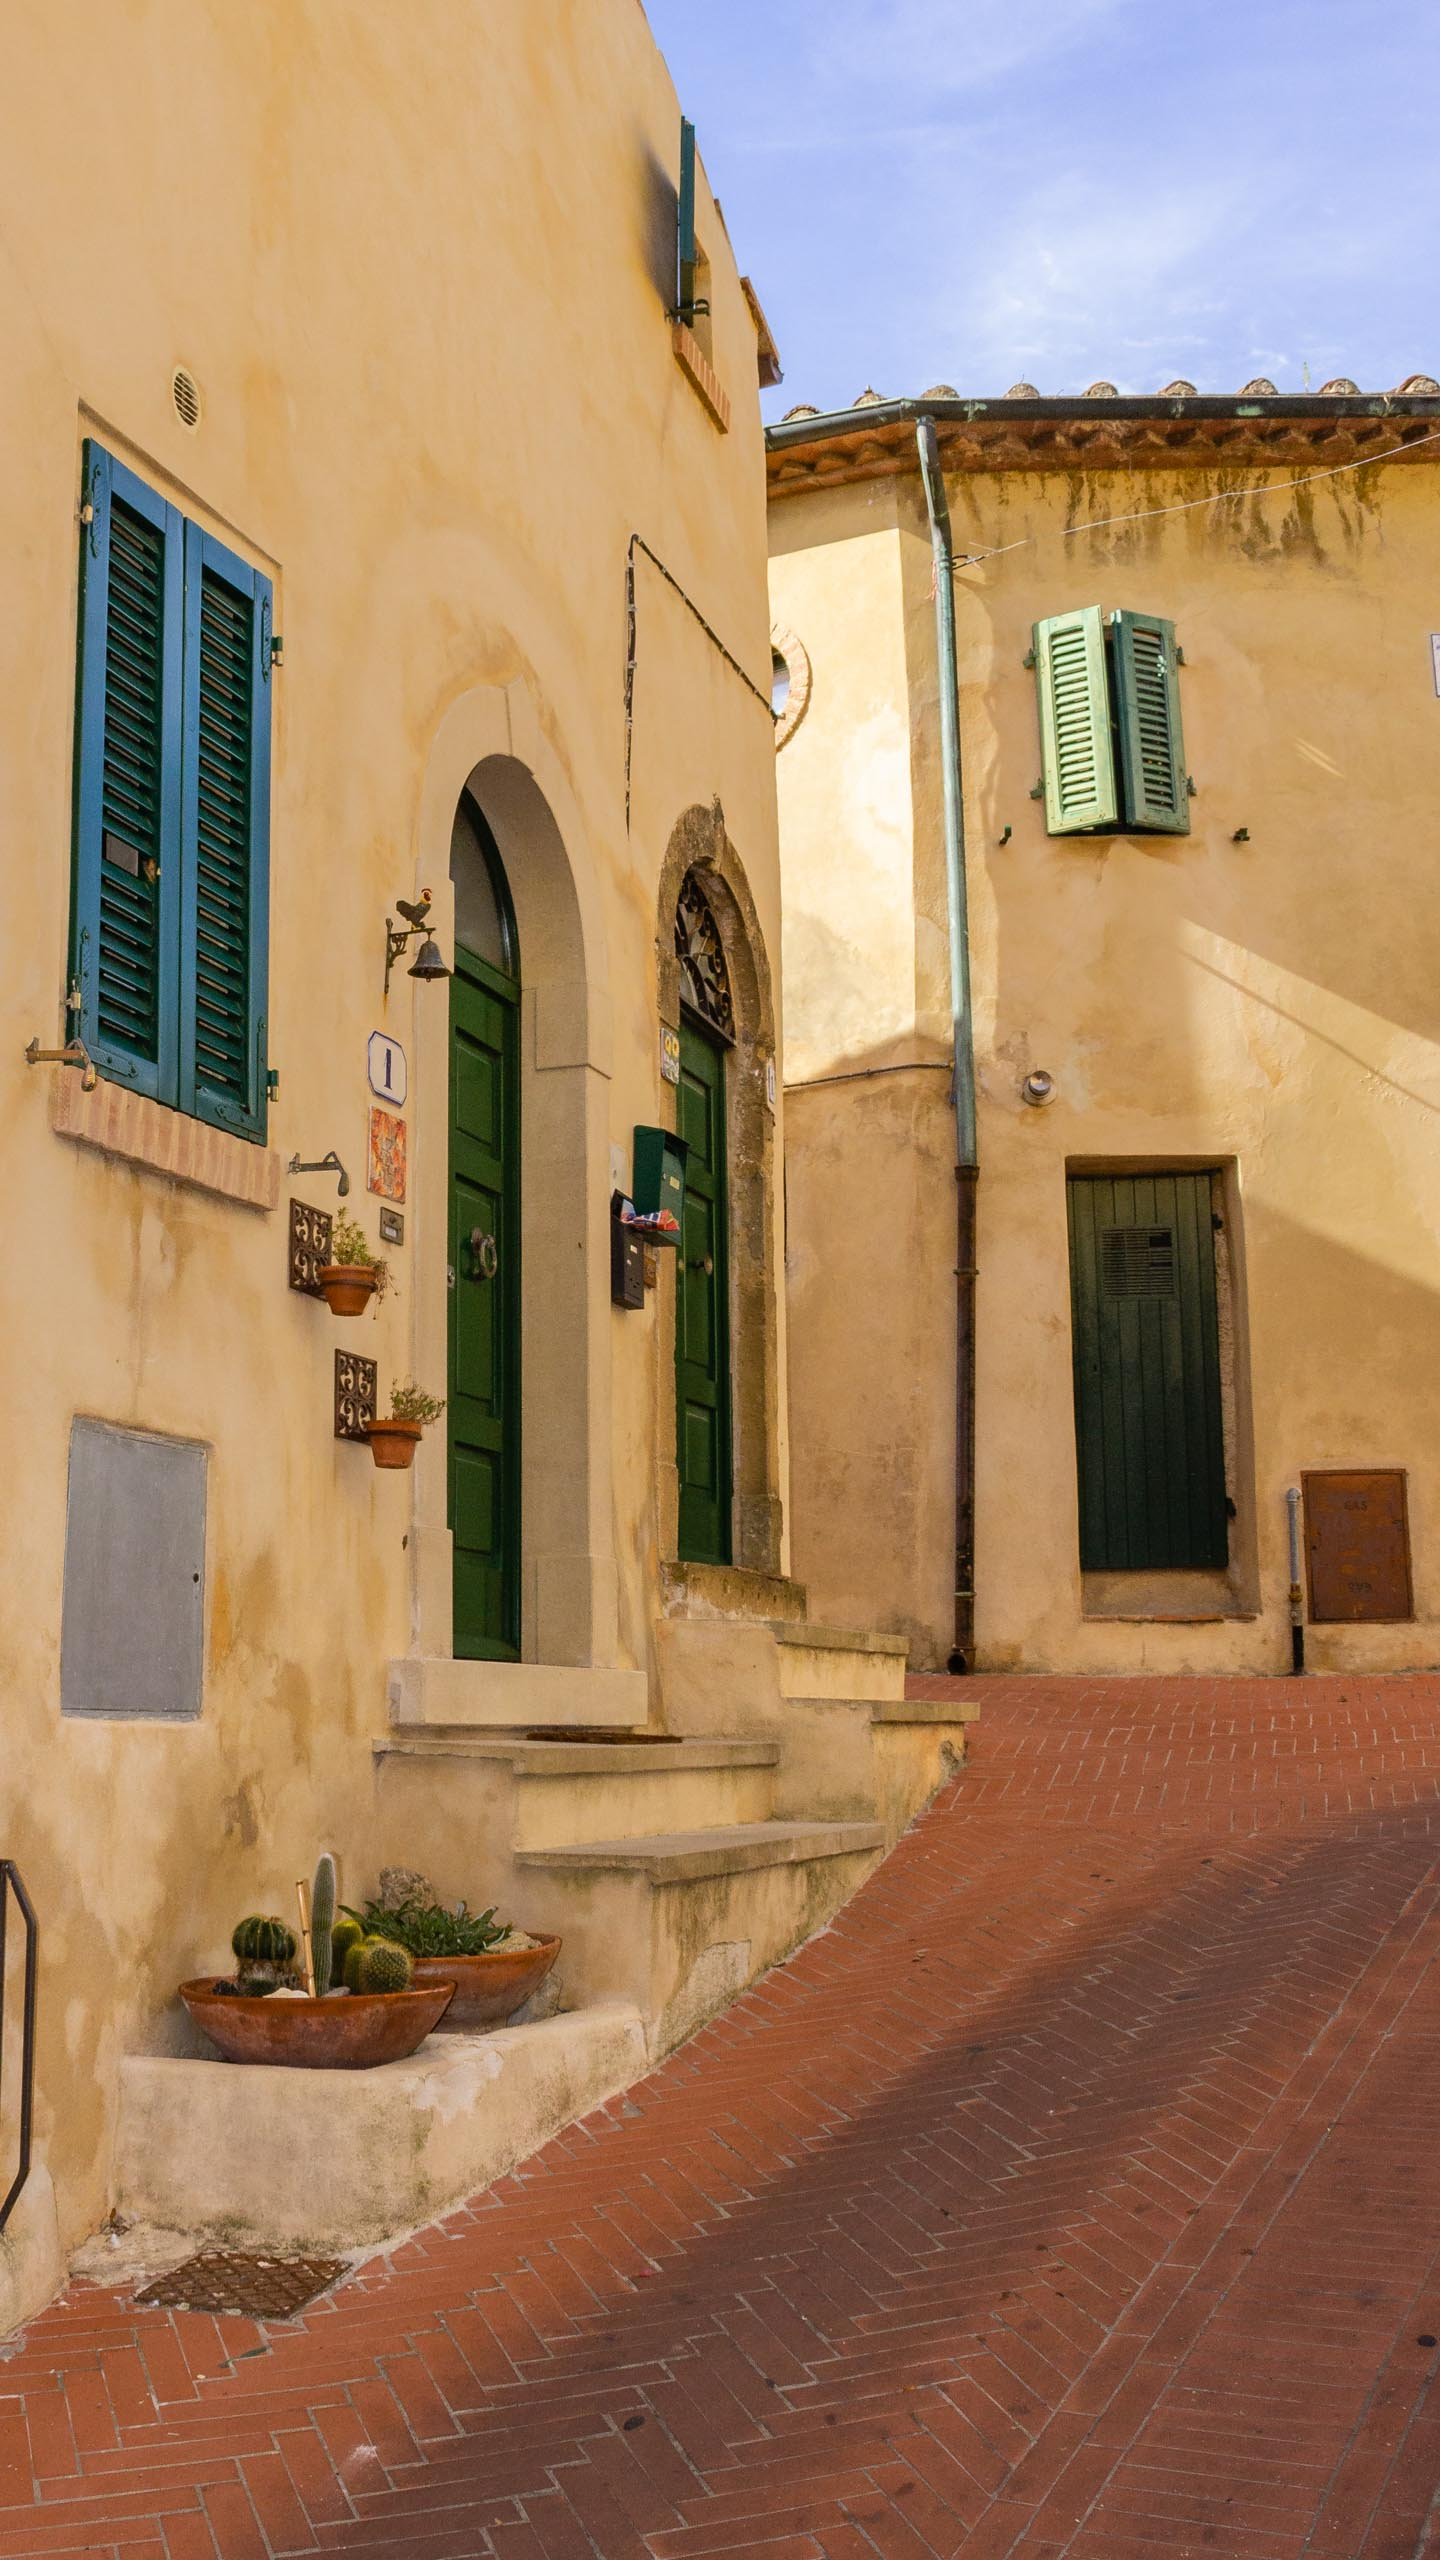 2013 10 Tuscany Montescudaio 002